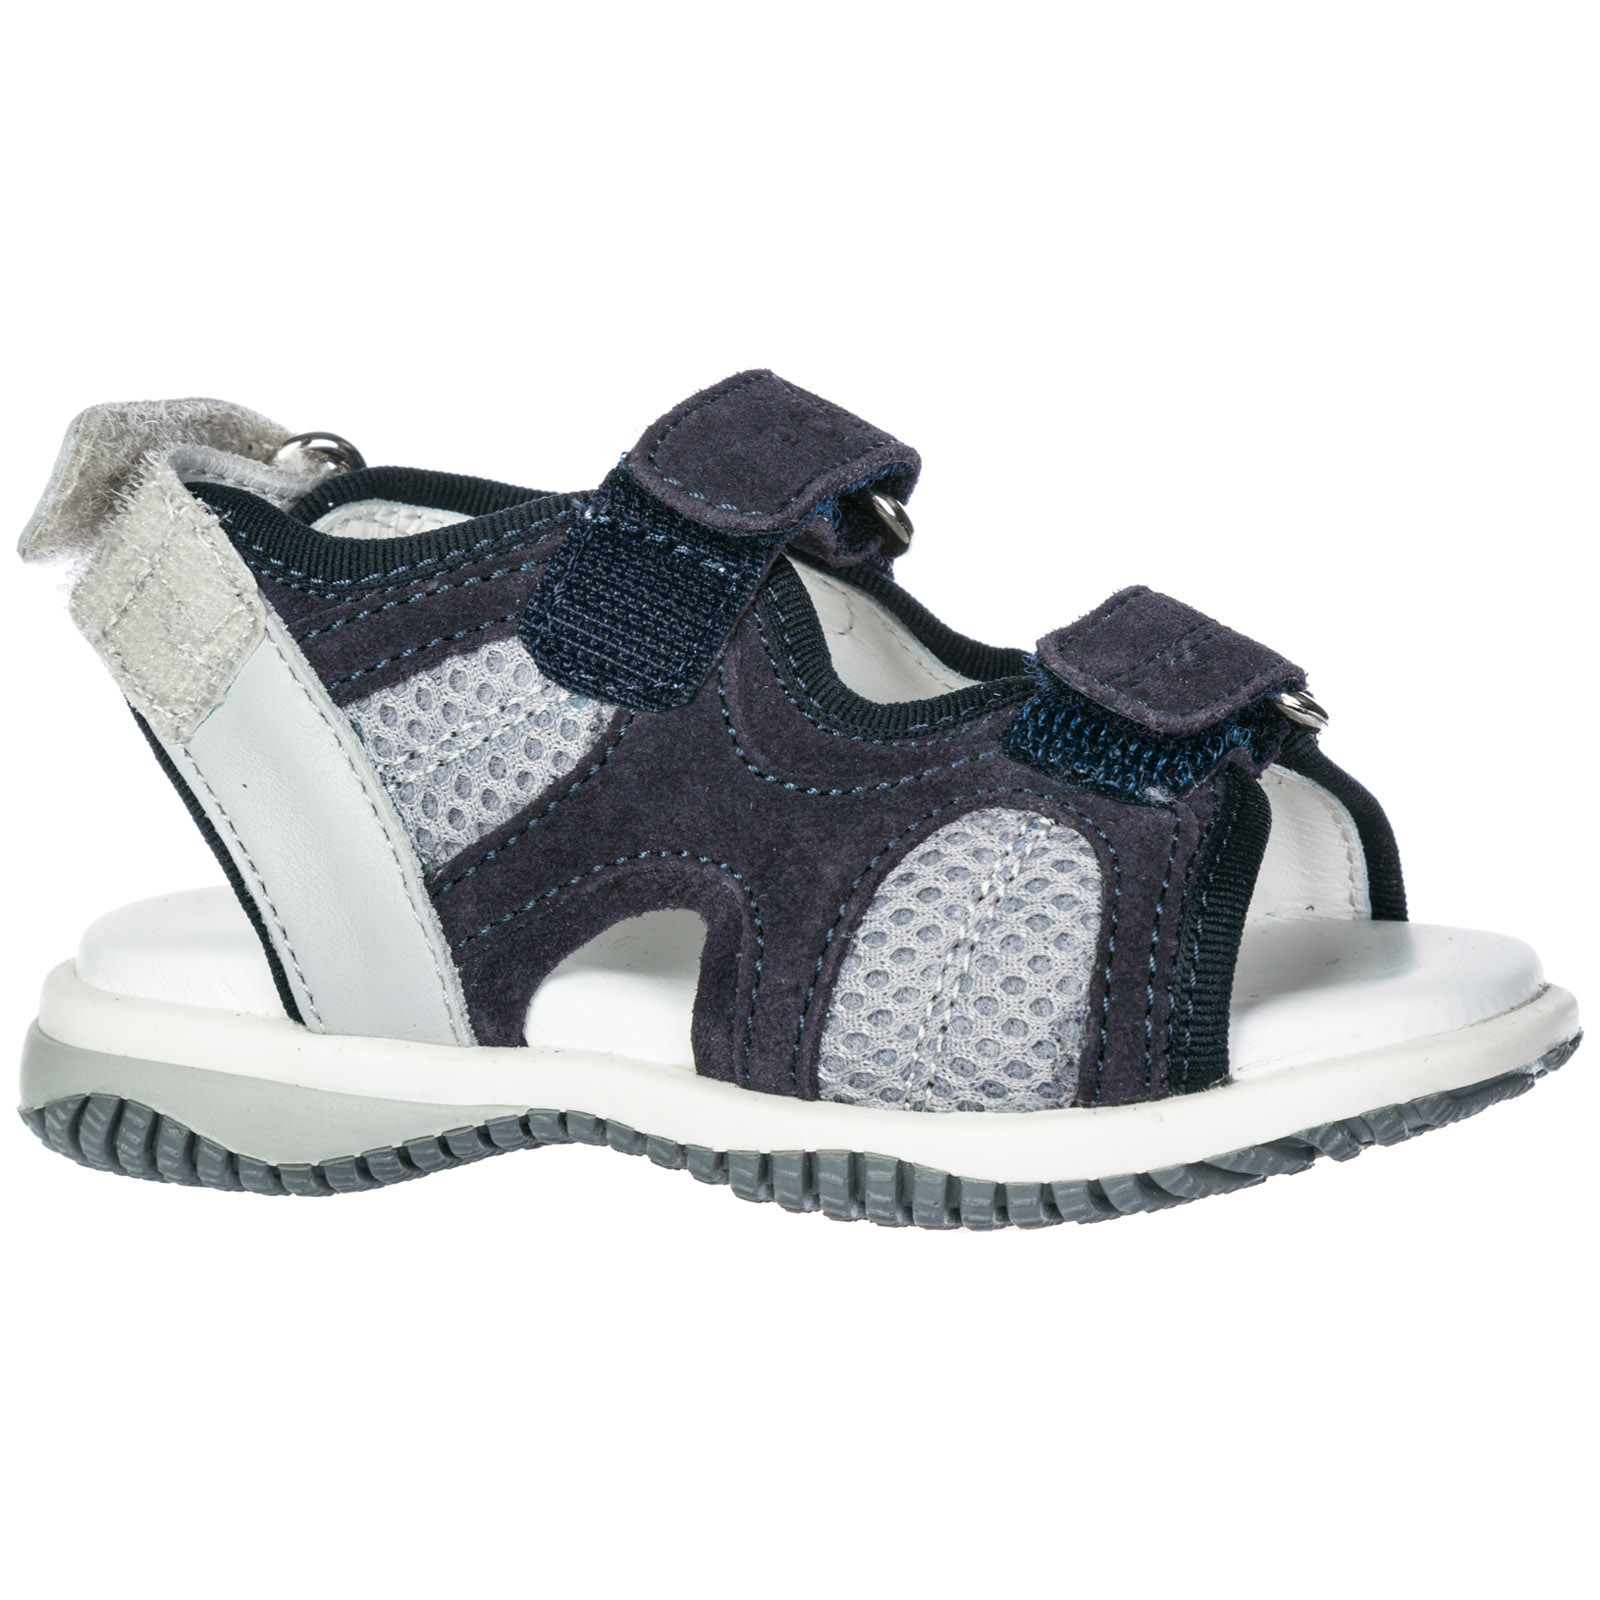 87c84373881b6 Sandals Hogan J114 HXT11404800FU83673 blu denim